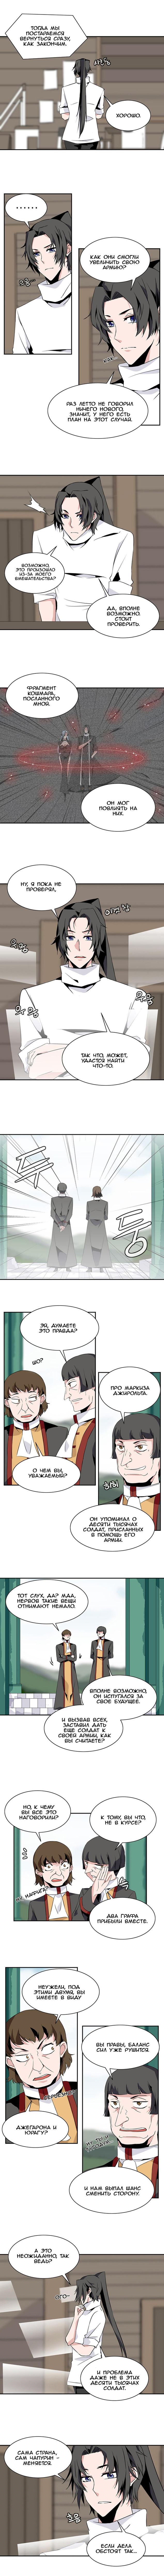 https://r1.ninemanga.com/comics/pic2/48/28784/322636/1491955668345.jpg Page 1